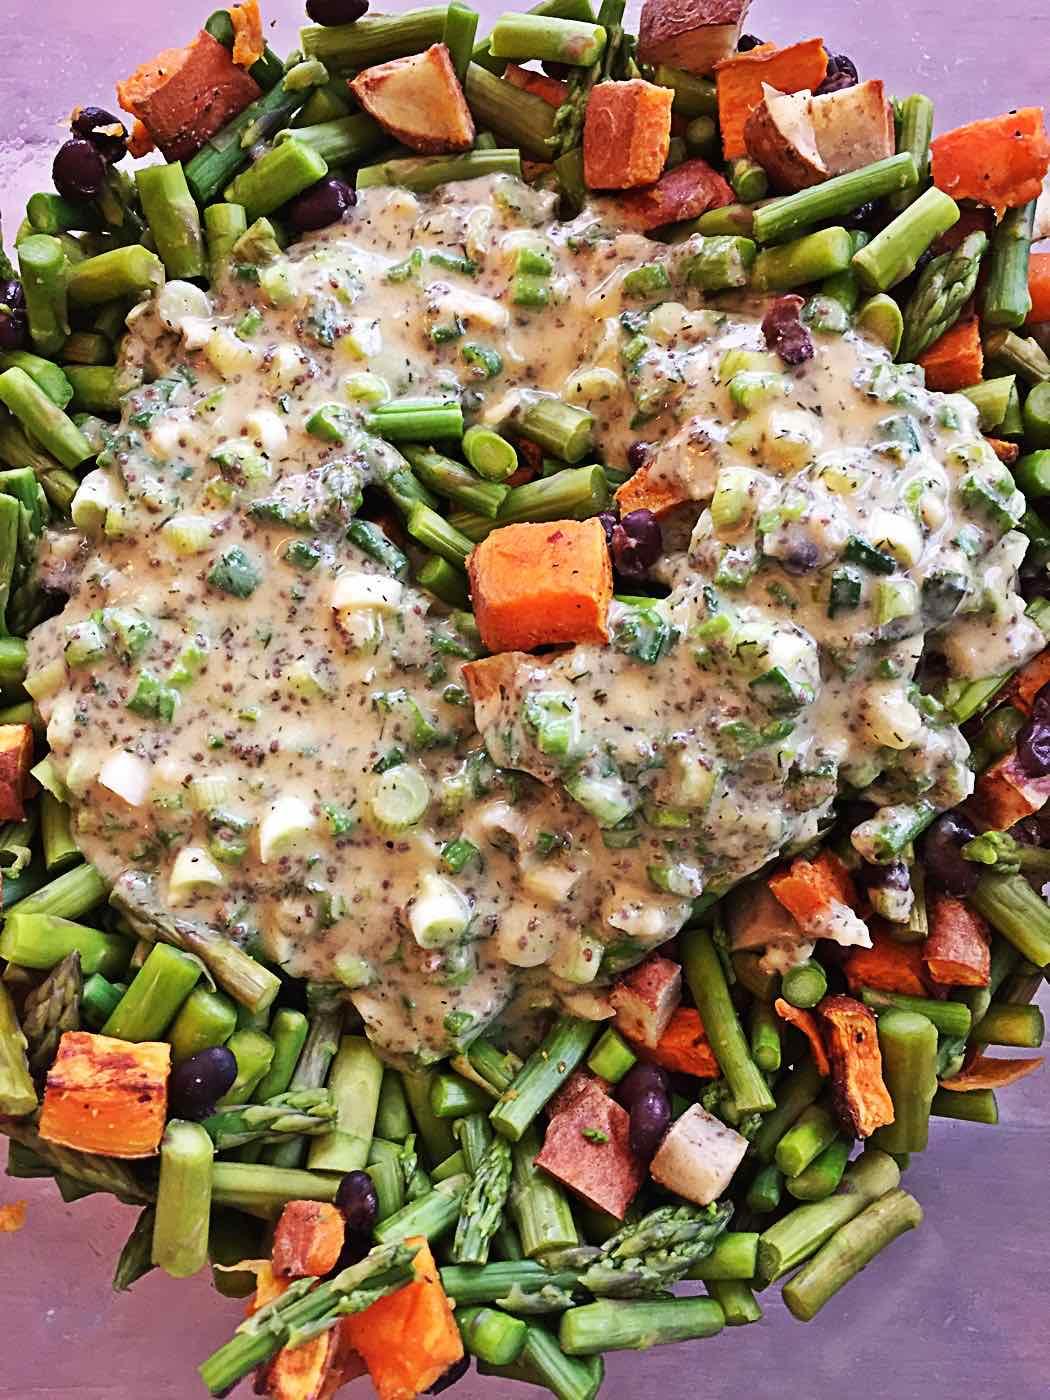 Dijon Mustard Dill Lemon Chia-seed Tahini wfpb salad dressing